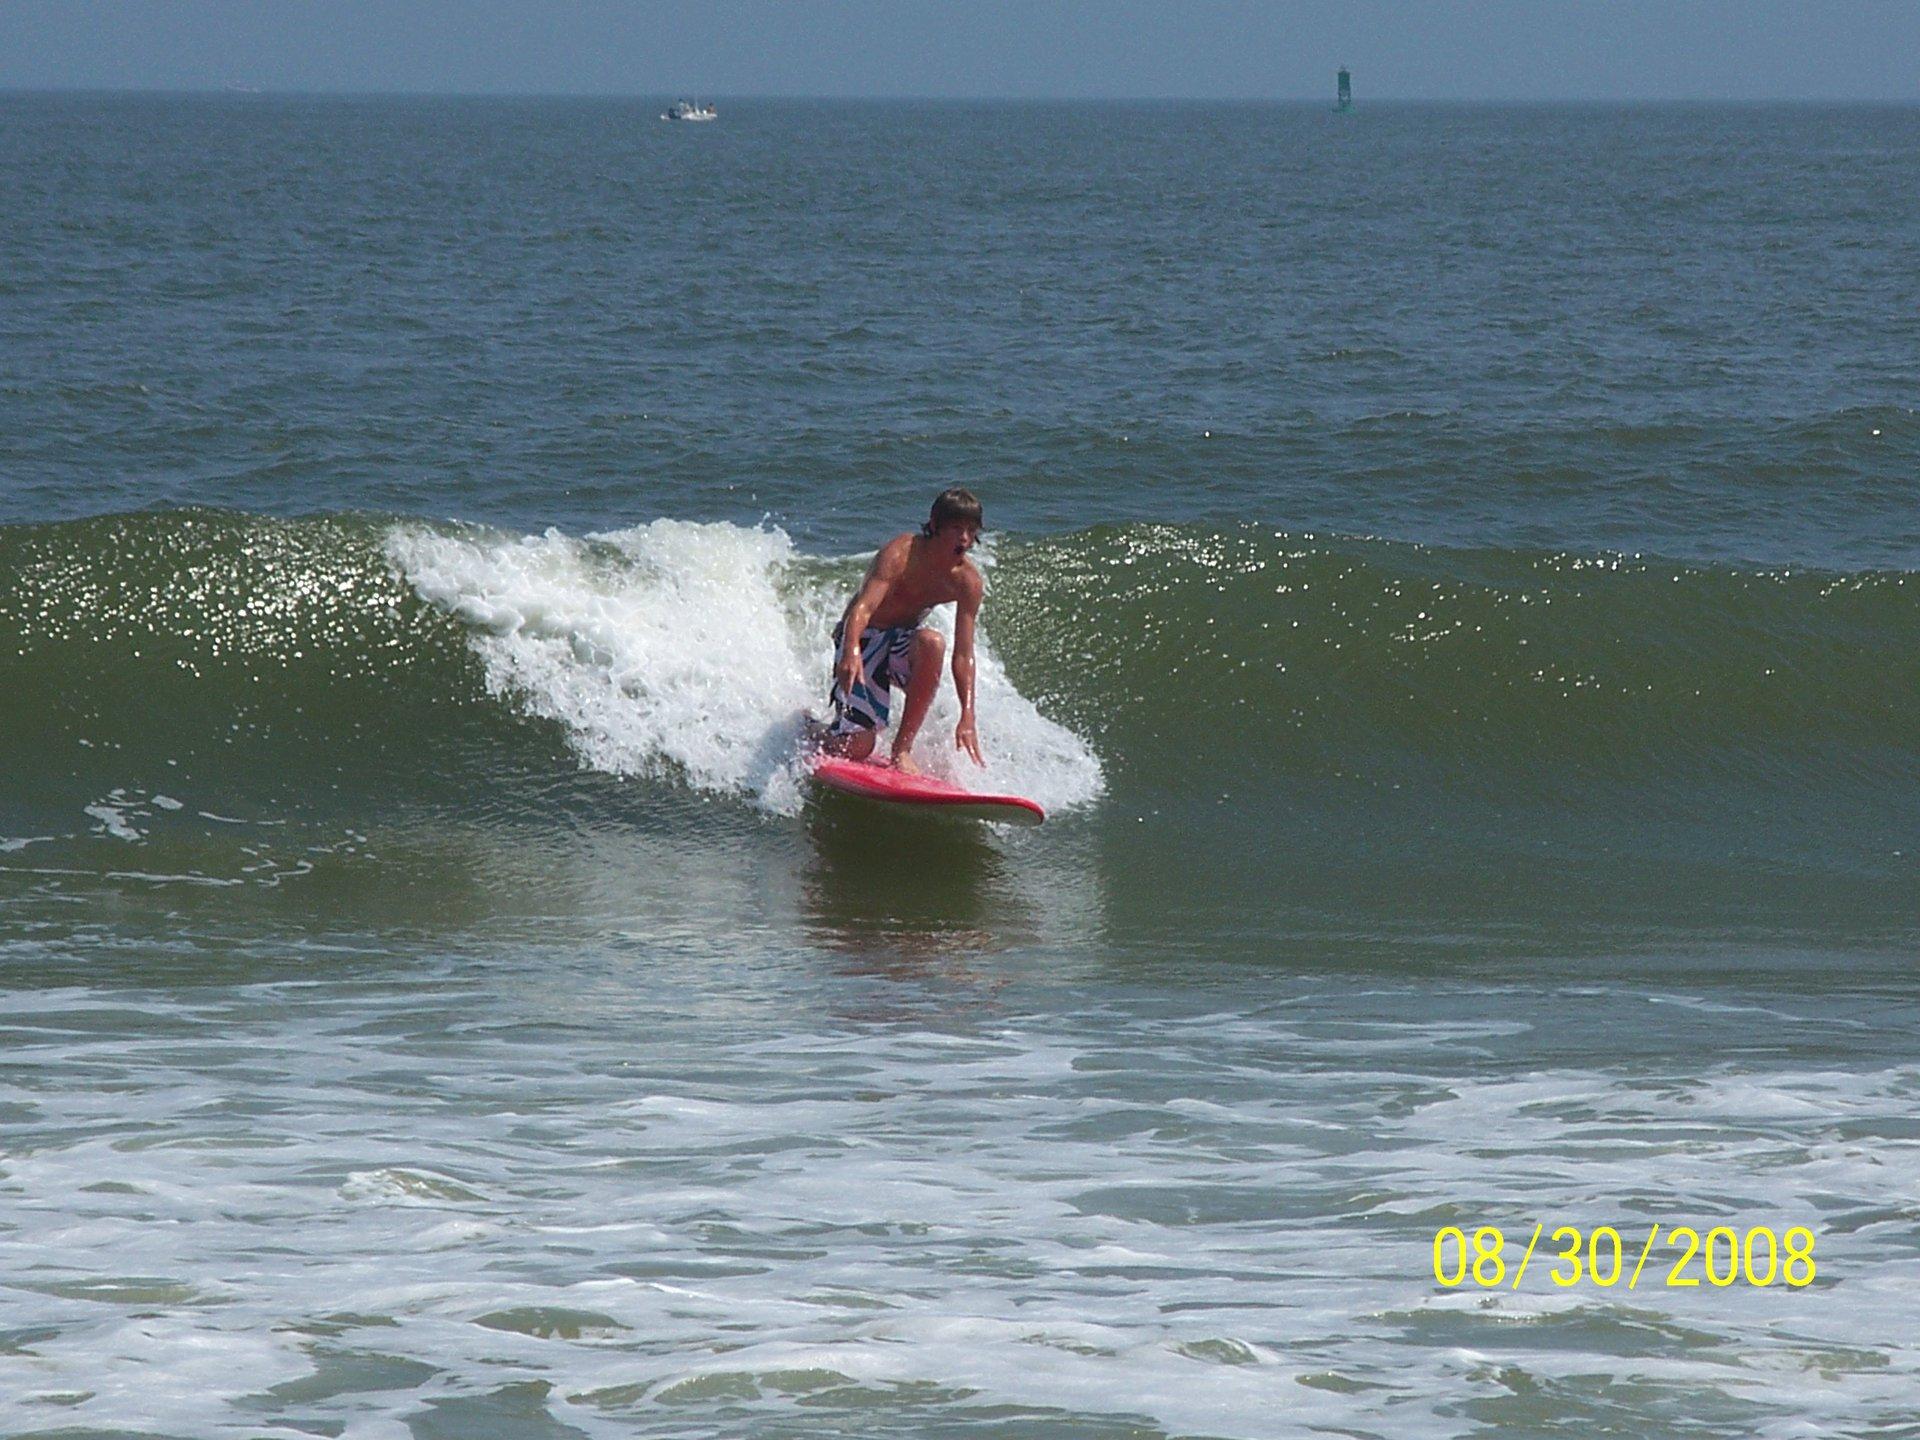 Surfing in Dela - where?